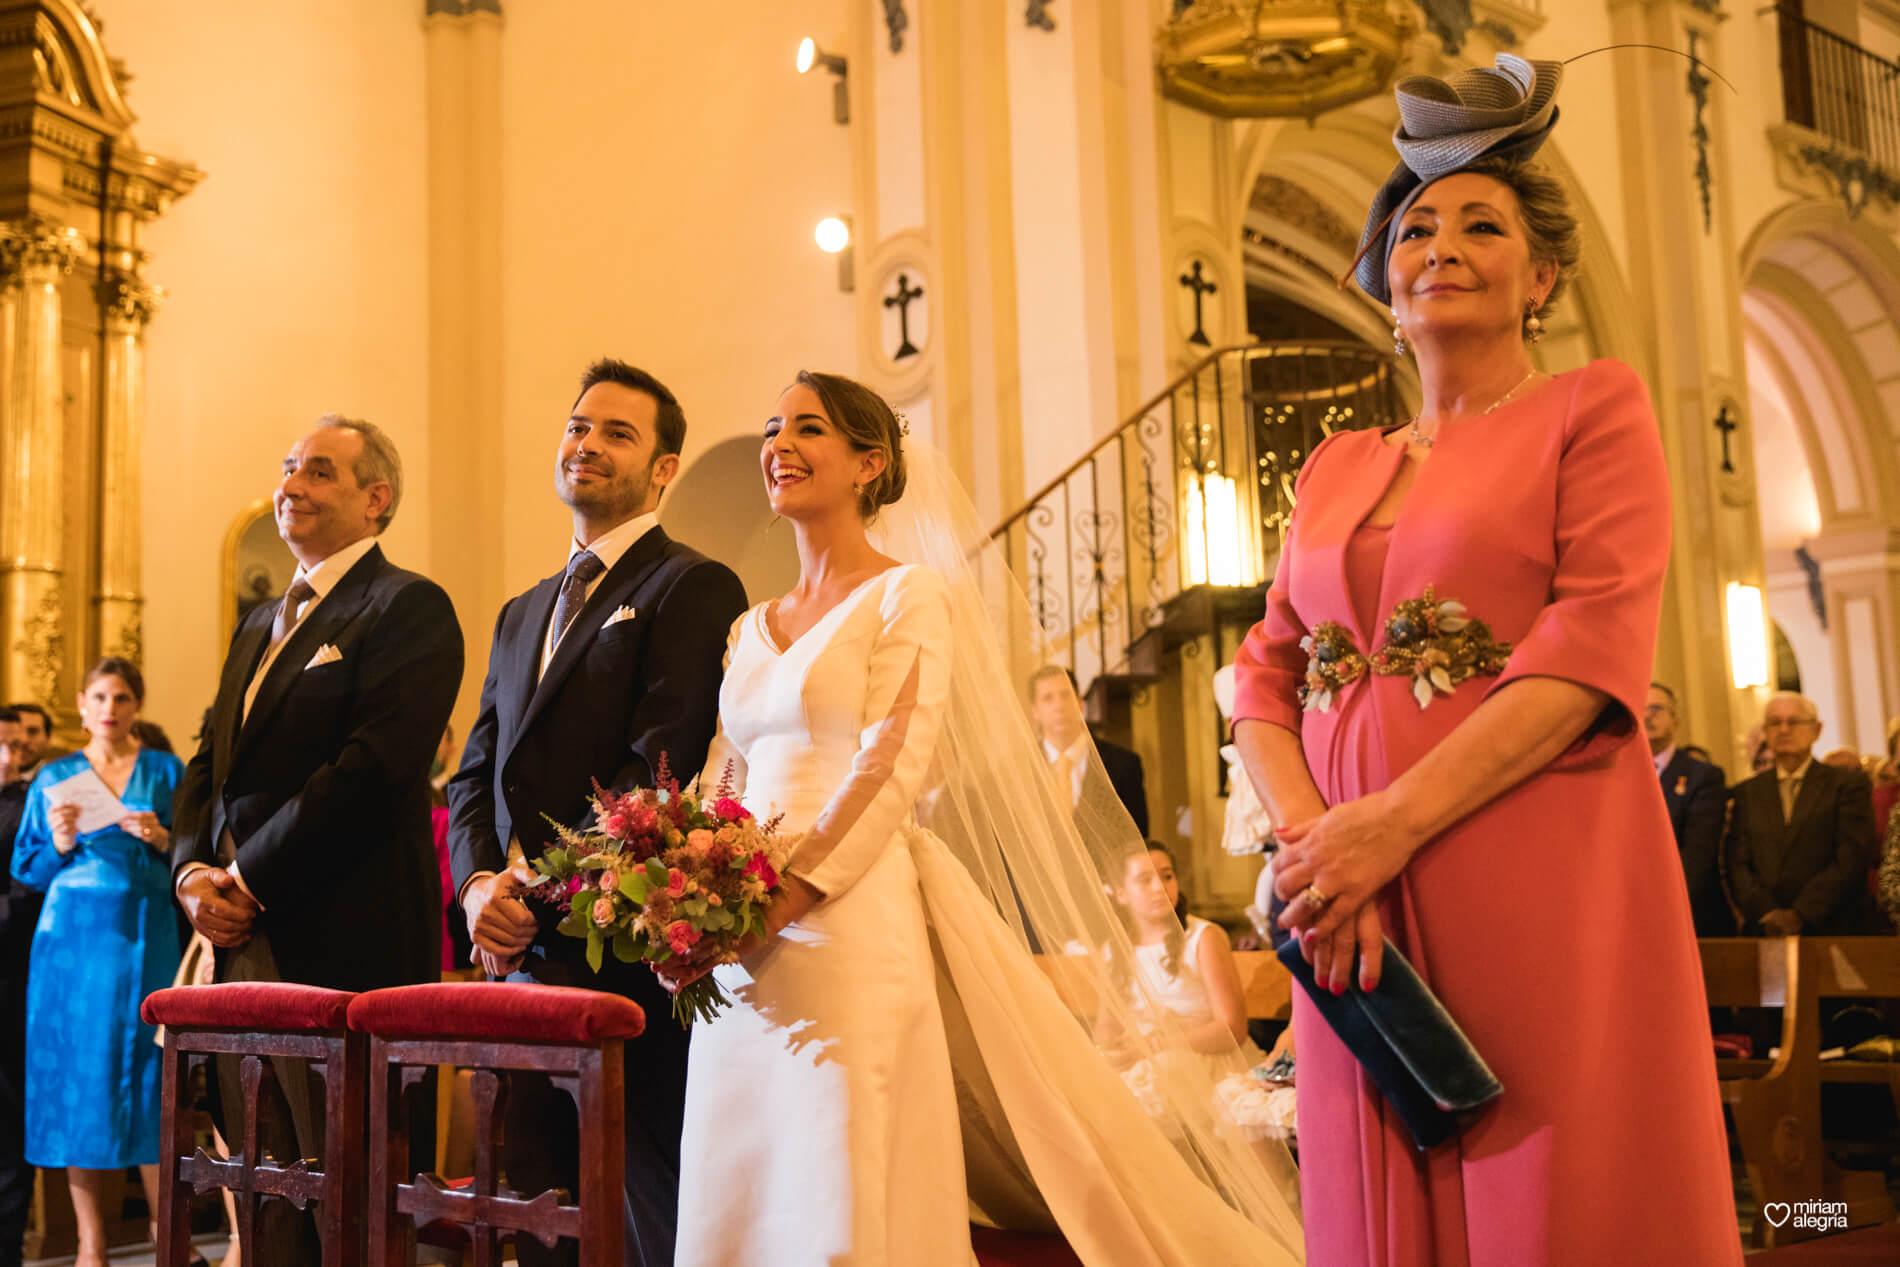 vestido-de-novia-paula-del-vas-miriam-alegria-fotografos-boda-murcia-51